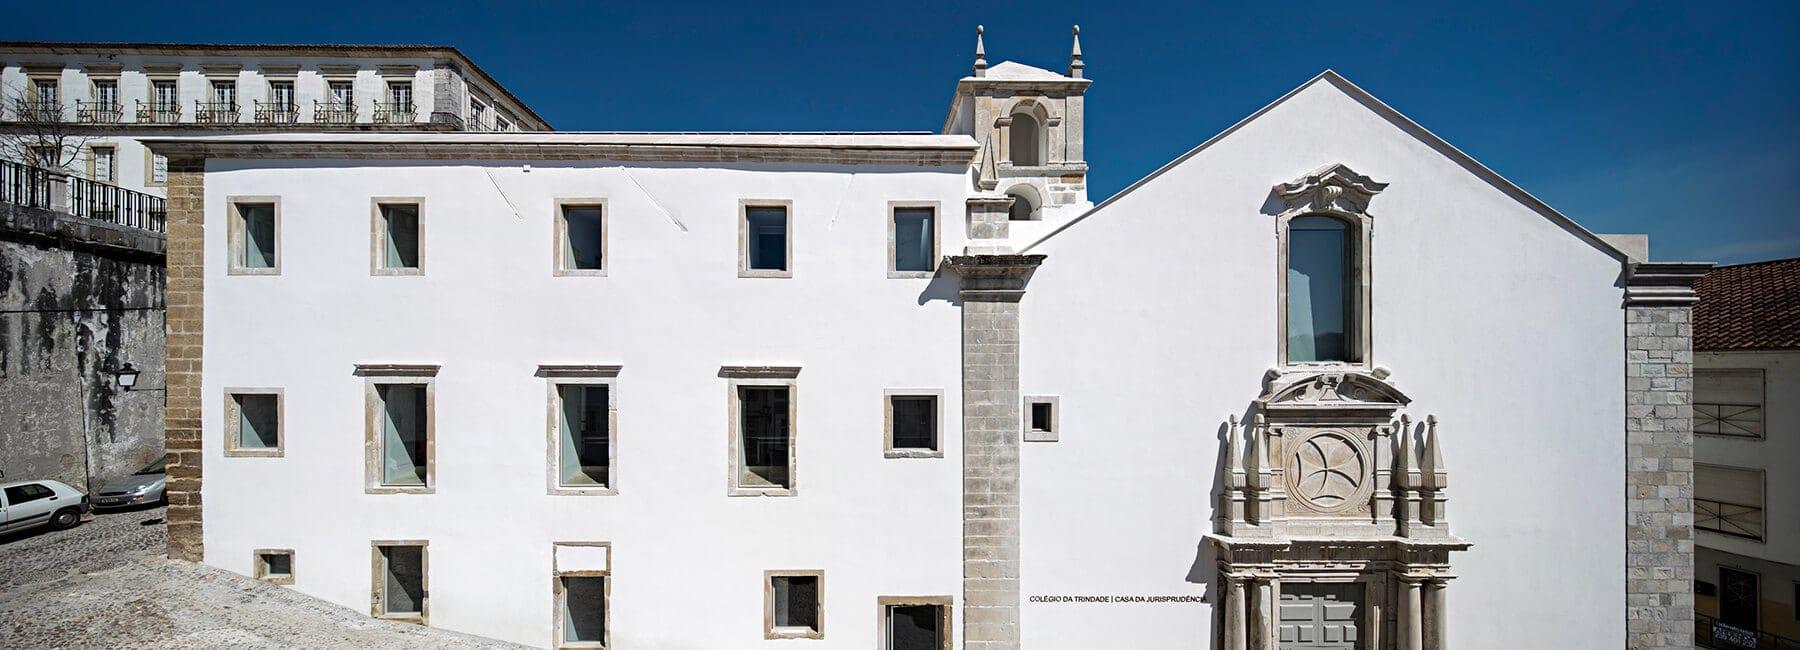 aires mateus trinity college renovation freeyork 1